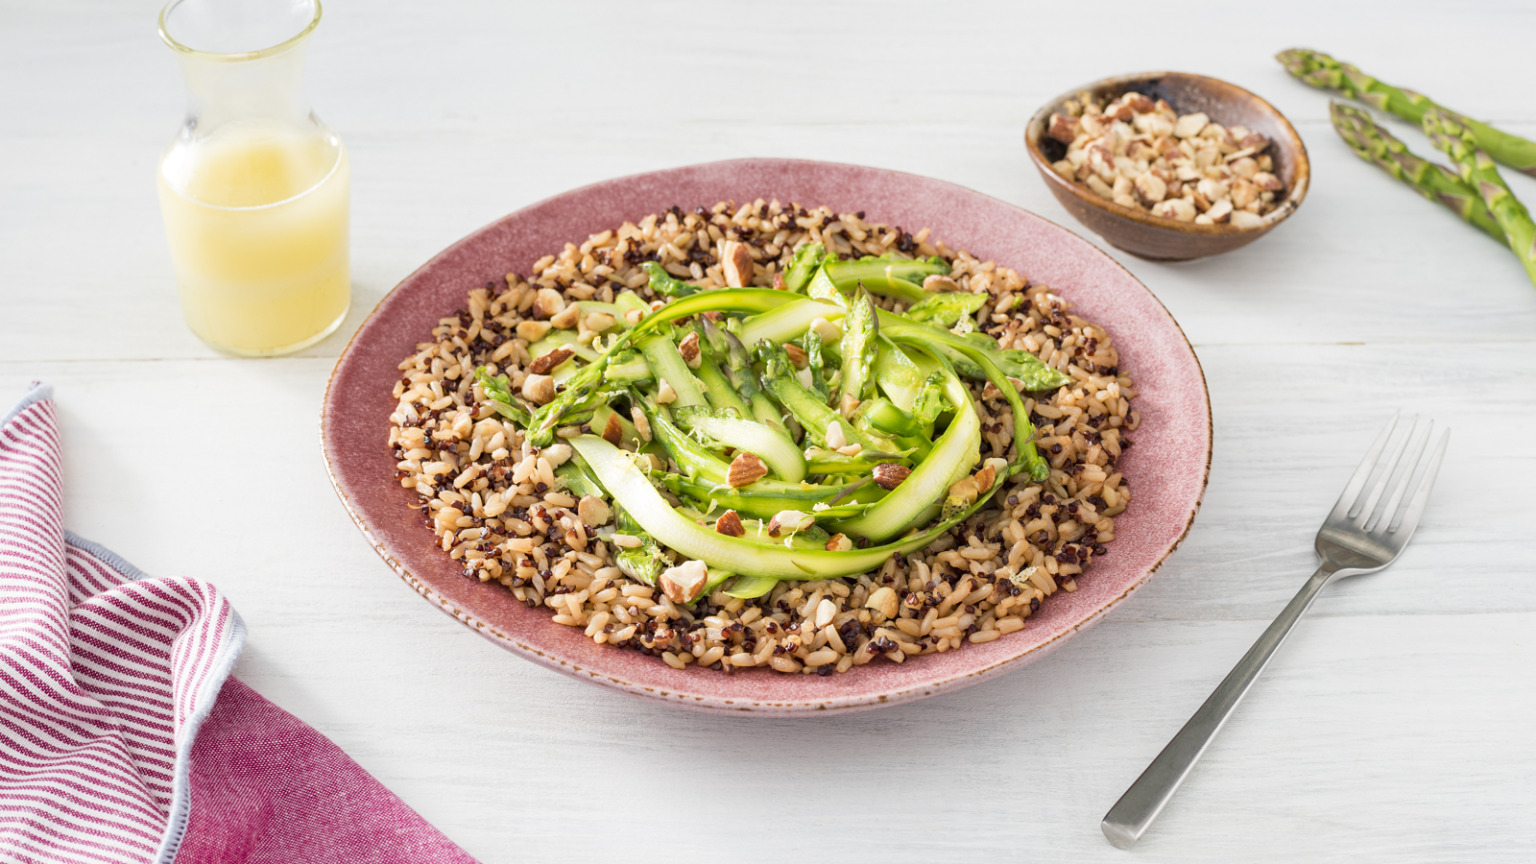 Asparagus Lemon Whole Grain Bowl